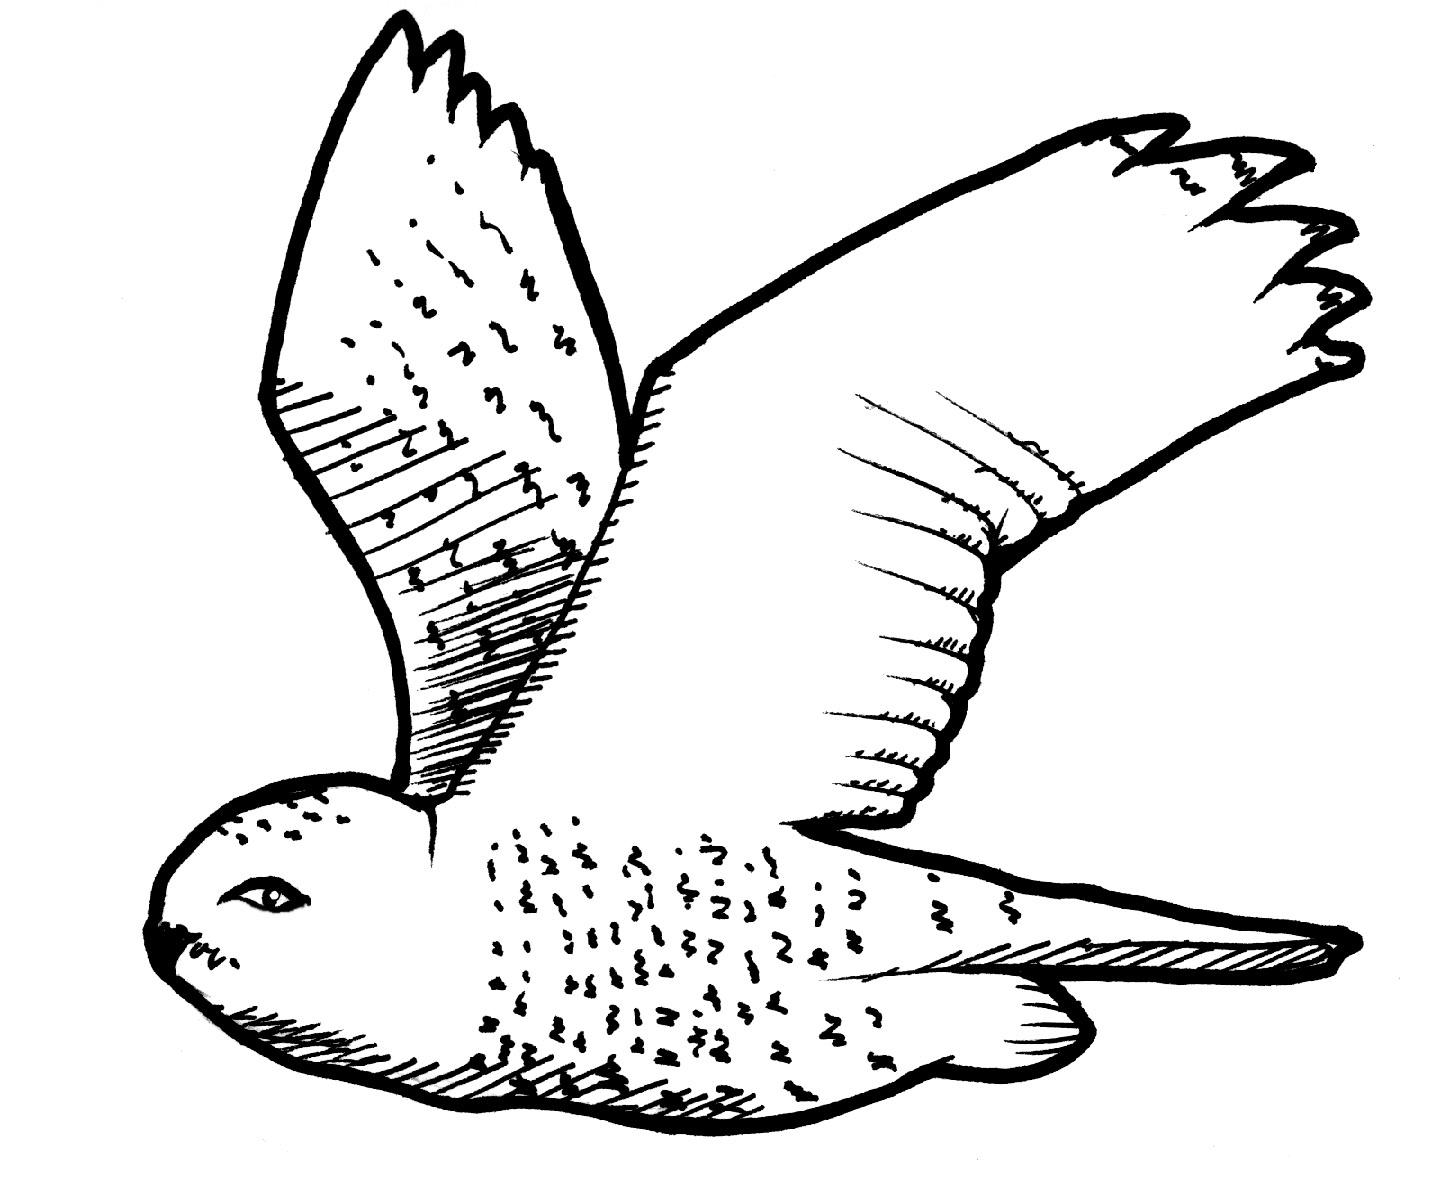 Snowy Owl Clip Art Snowy .-Snowy Owl Clip Art Snowy .-16